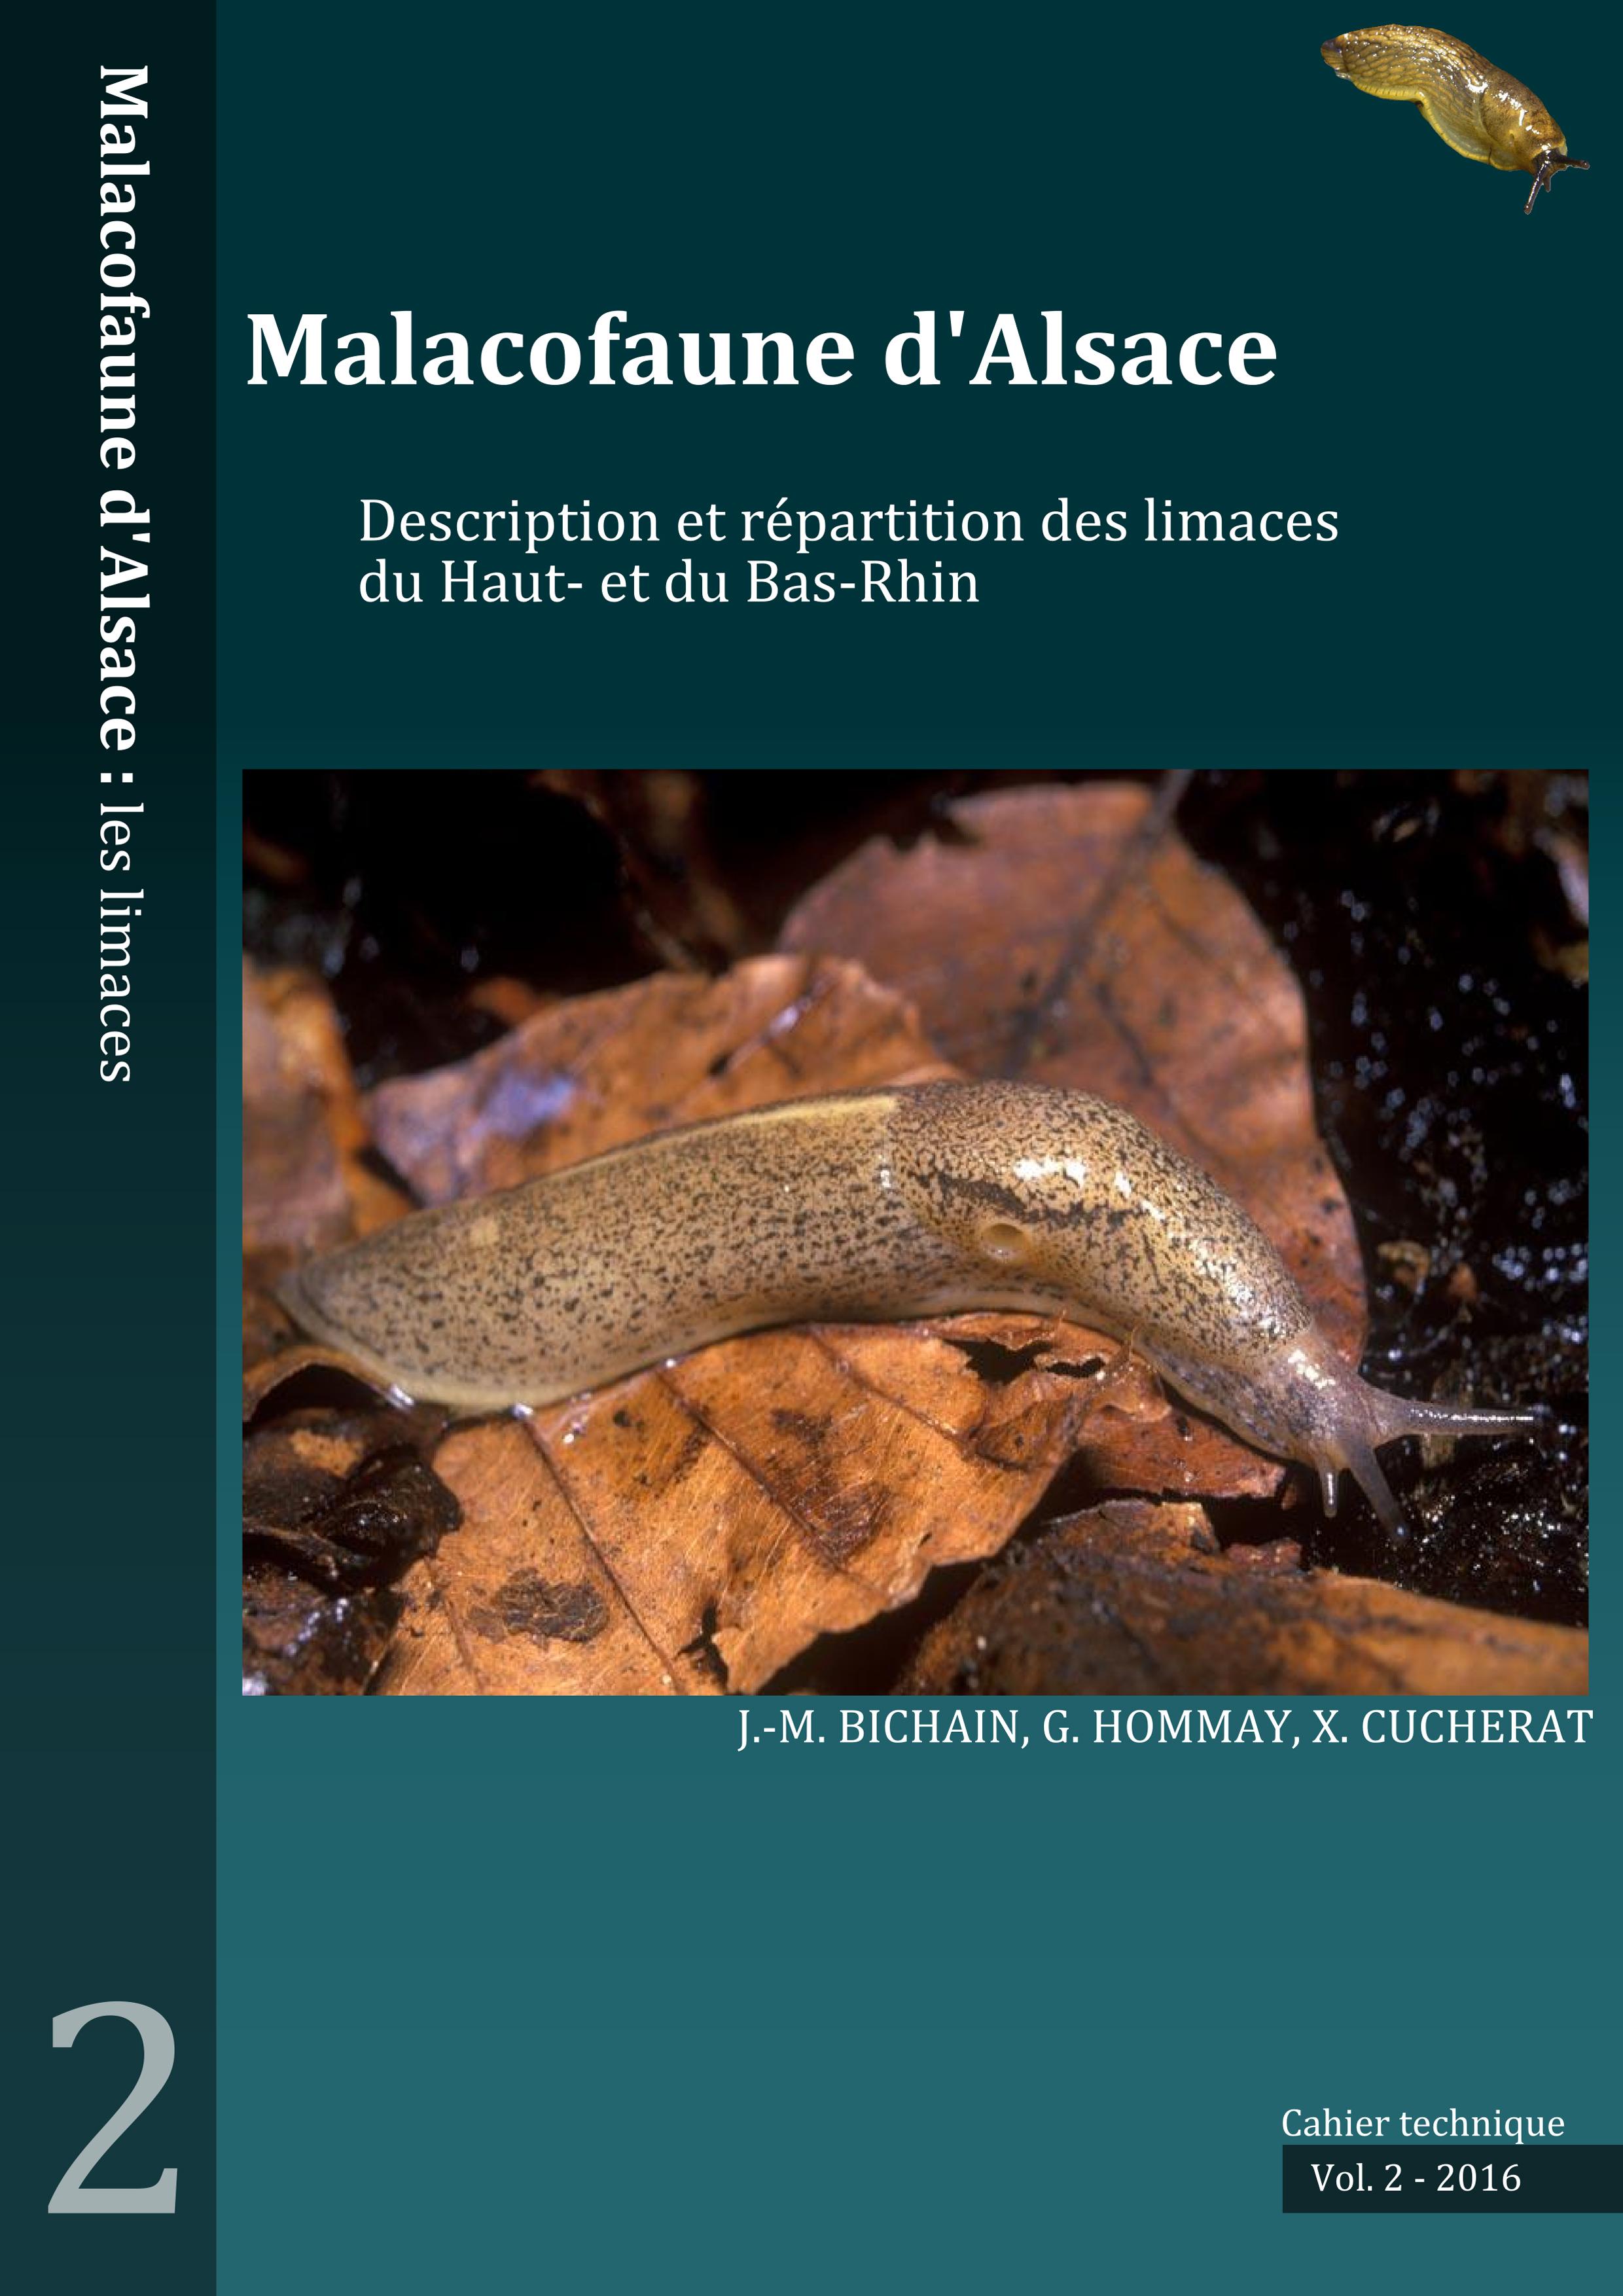 https://cdnfiles2.biolovision.net/www.faune-alsace.org/userfiles/mollusques/limace2016.jpg